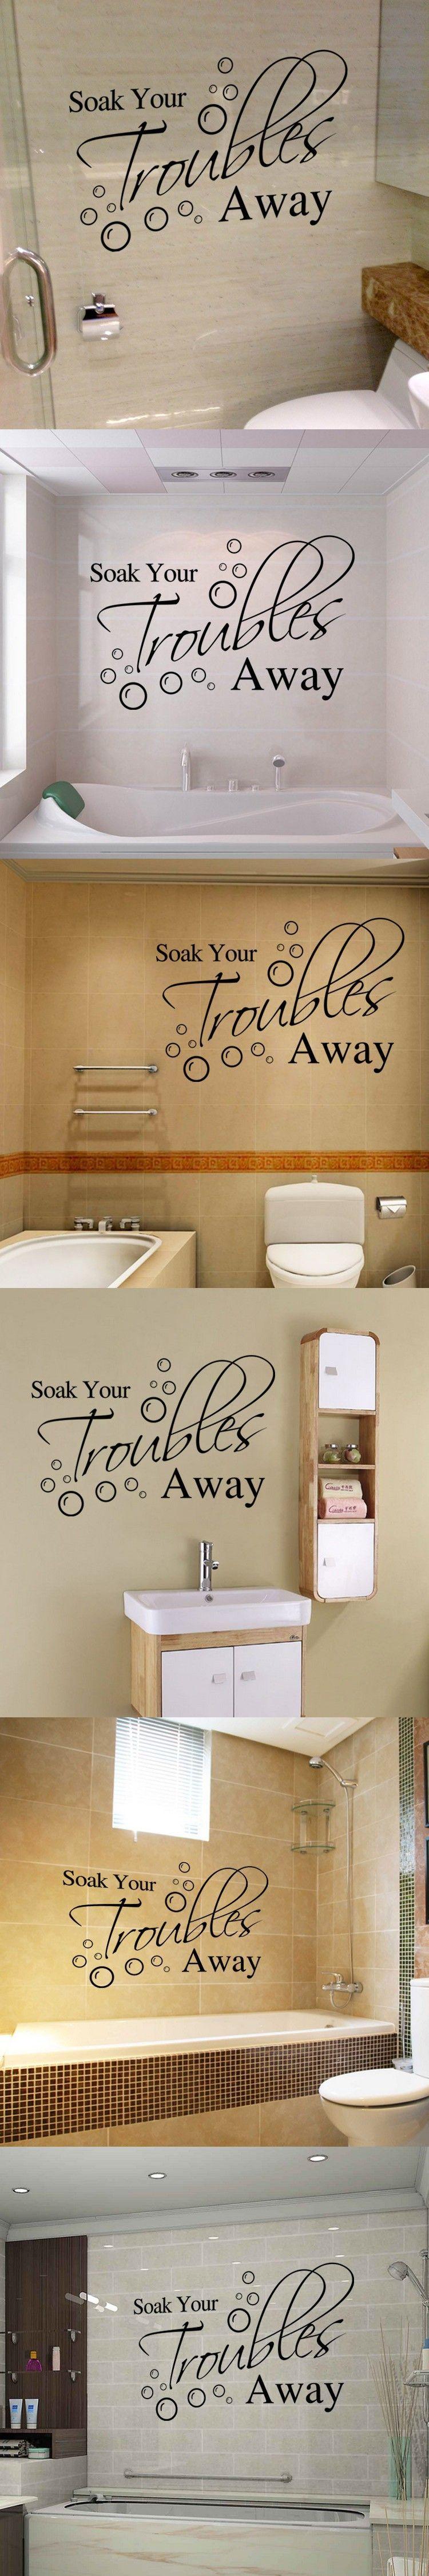 Badezimmer dekor zitate aw change your mood inspirational mirror decal  motivational